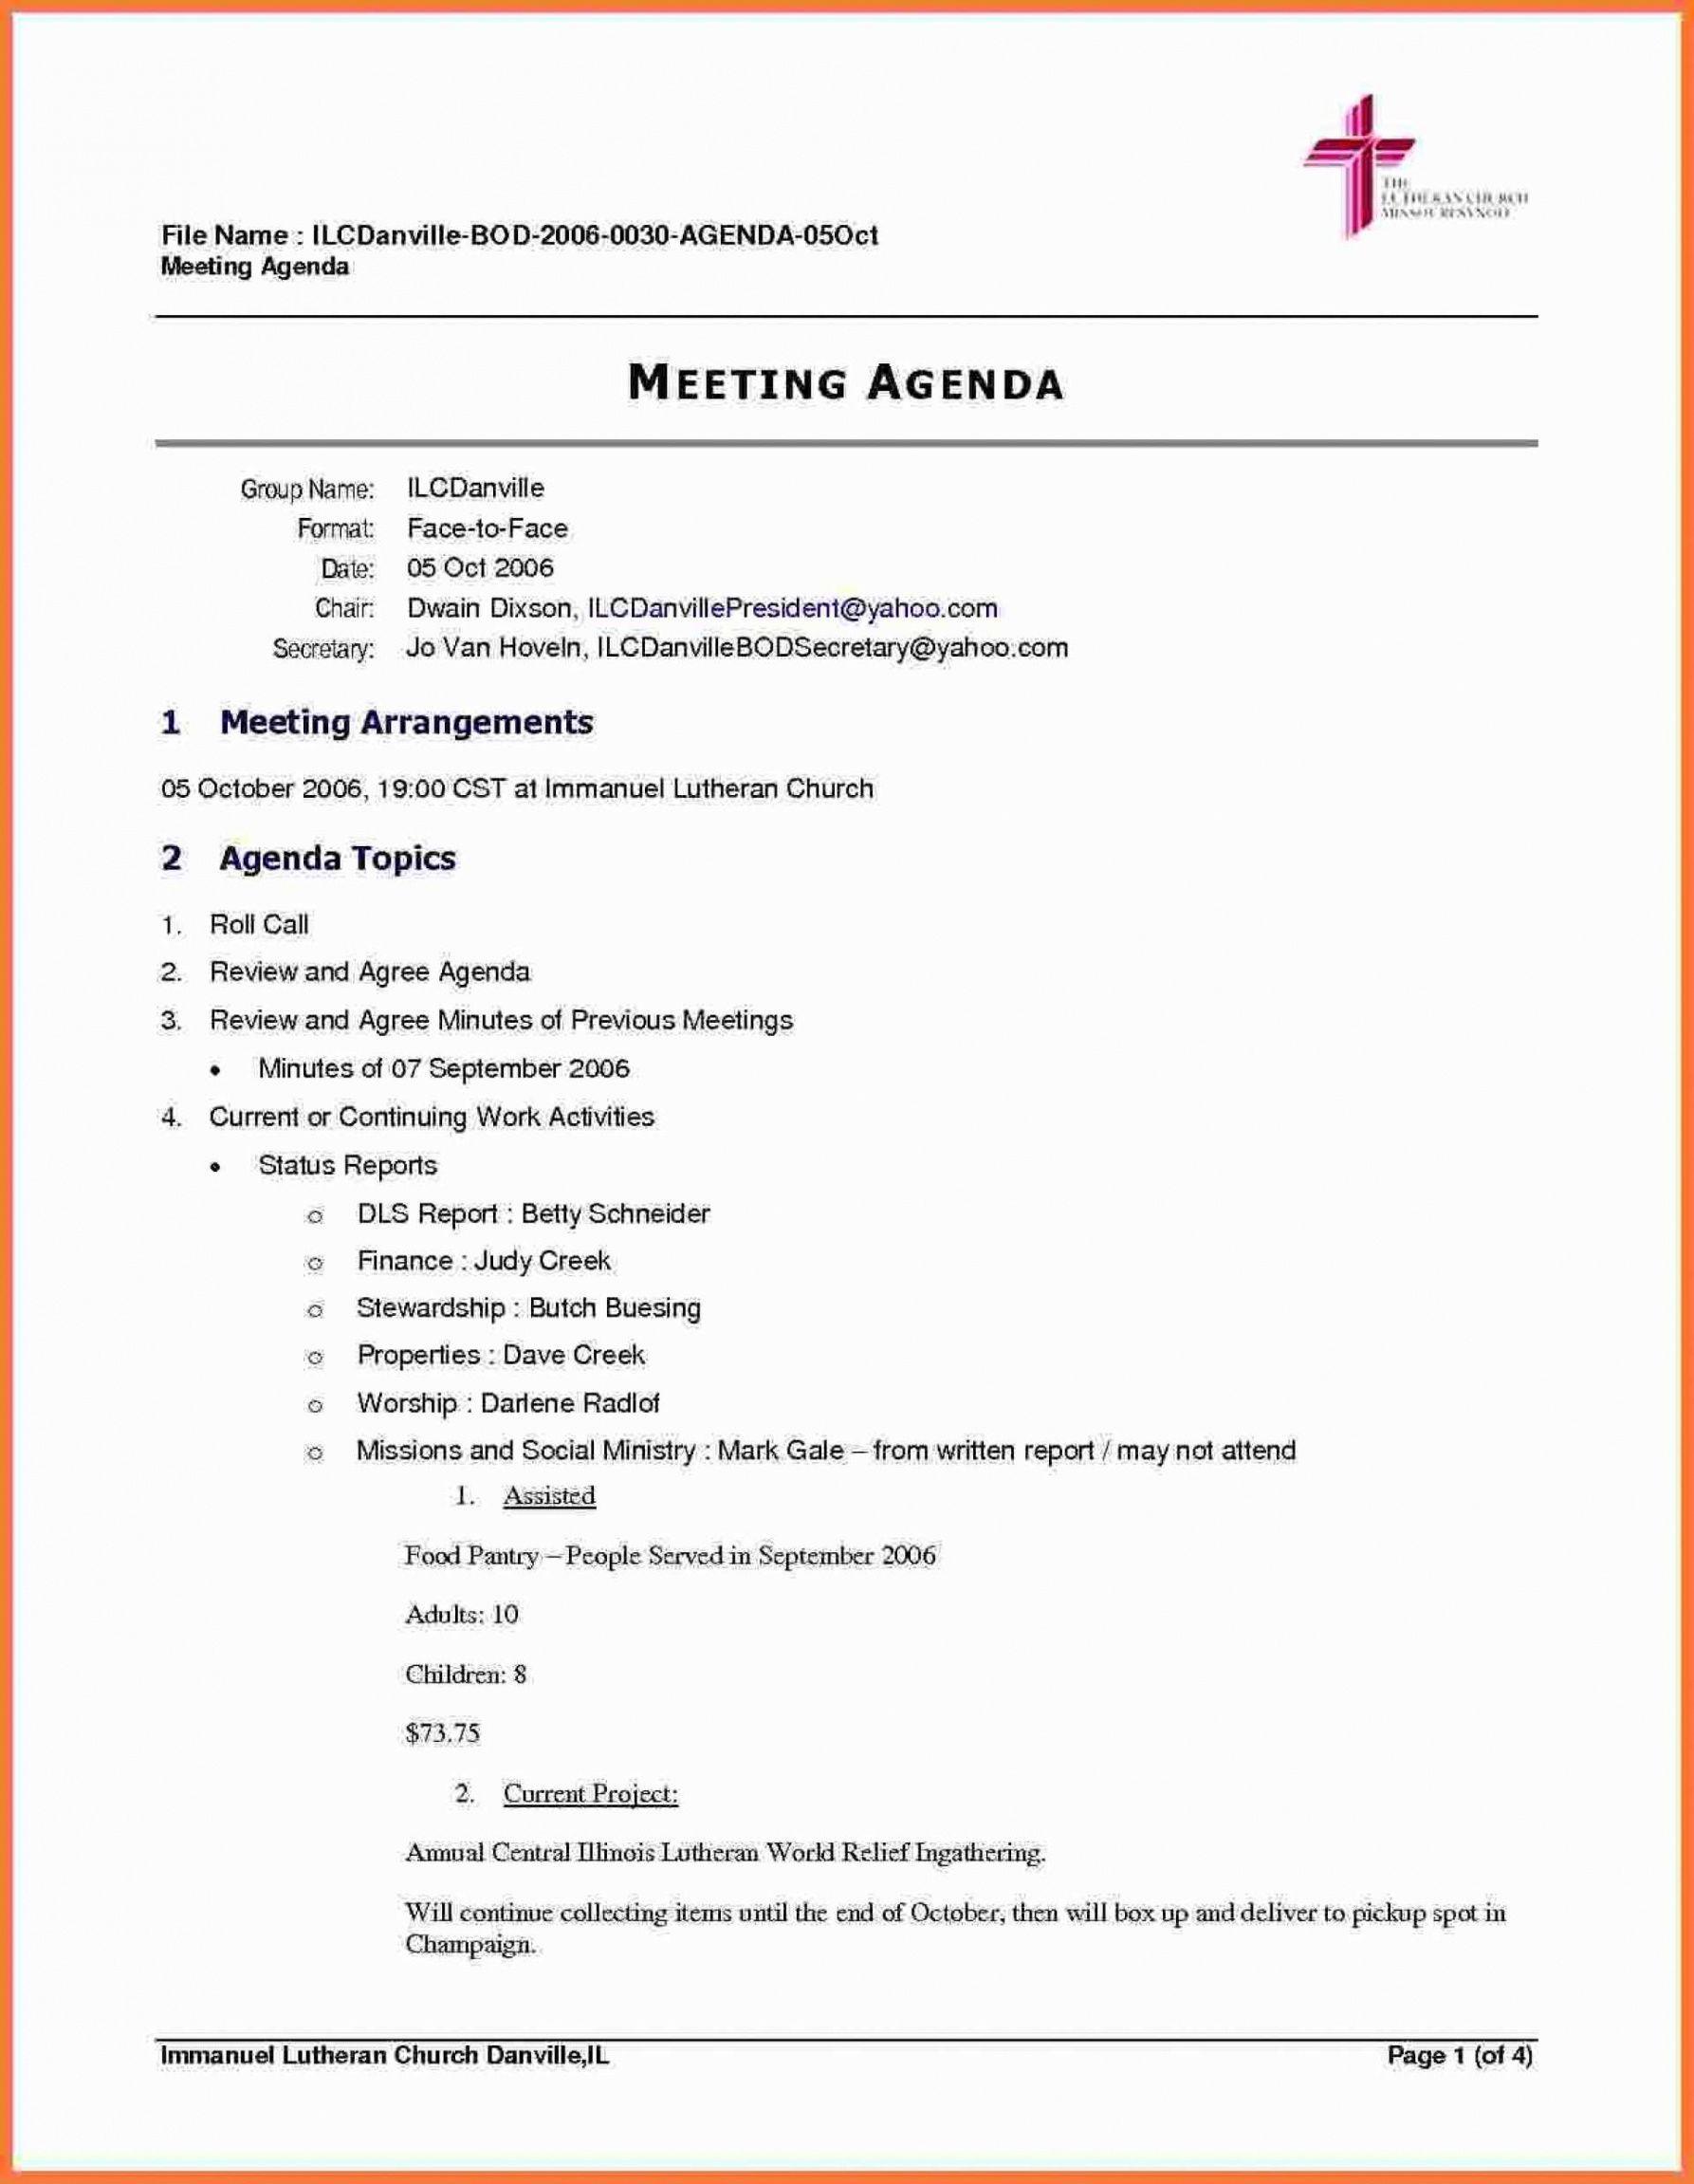 15 Creating Board Meeting Agenda Template Uk For Ms Word Meeting Agenda Template Word Downloa Agenda Template Meeting Agenda Template Meeting Agenda Workshop agenda template microsoft word